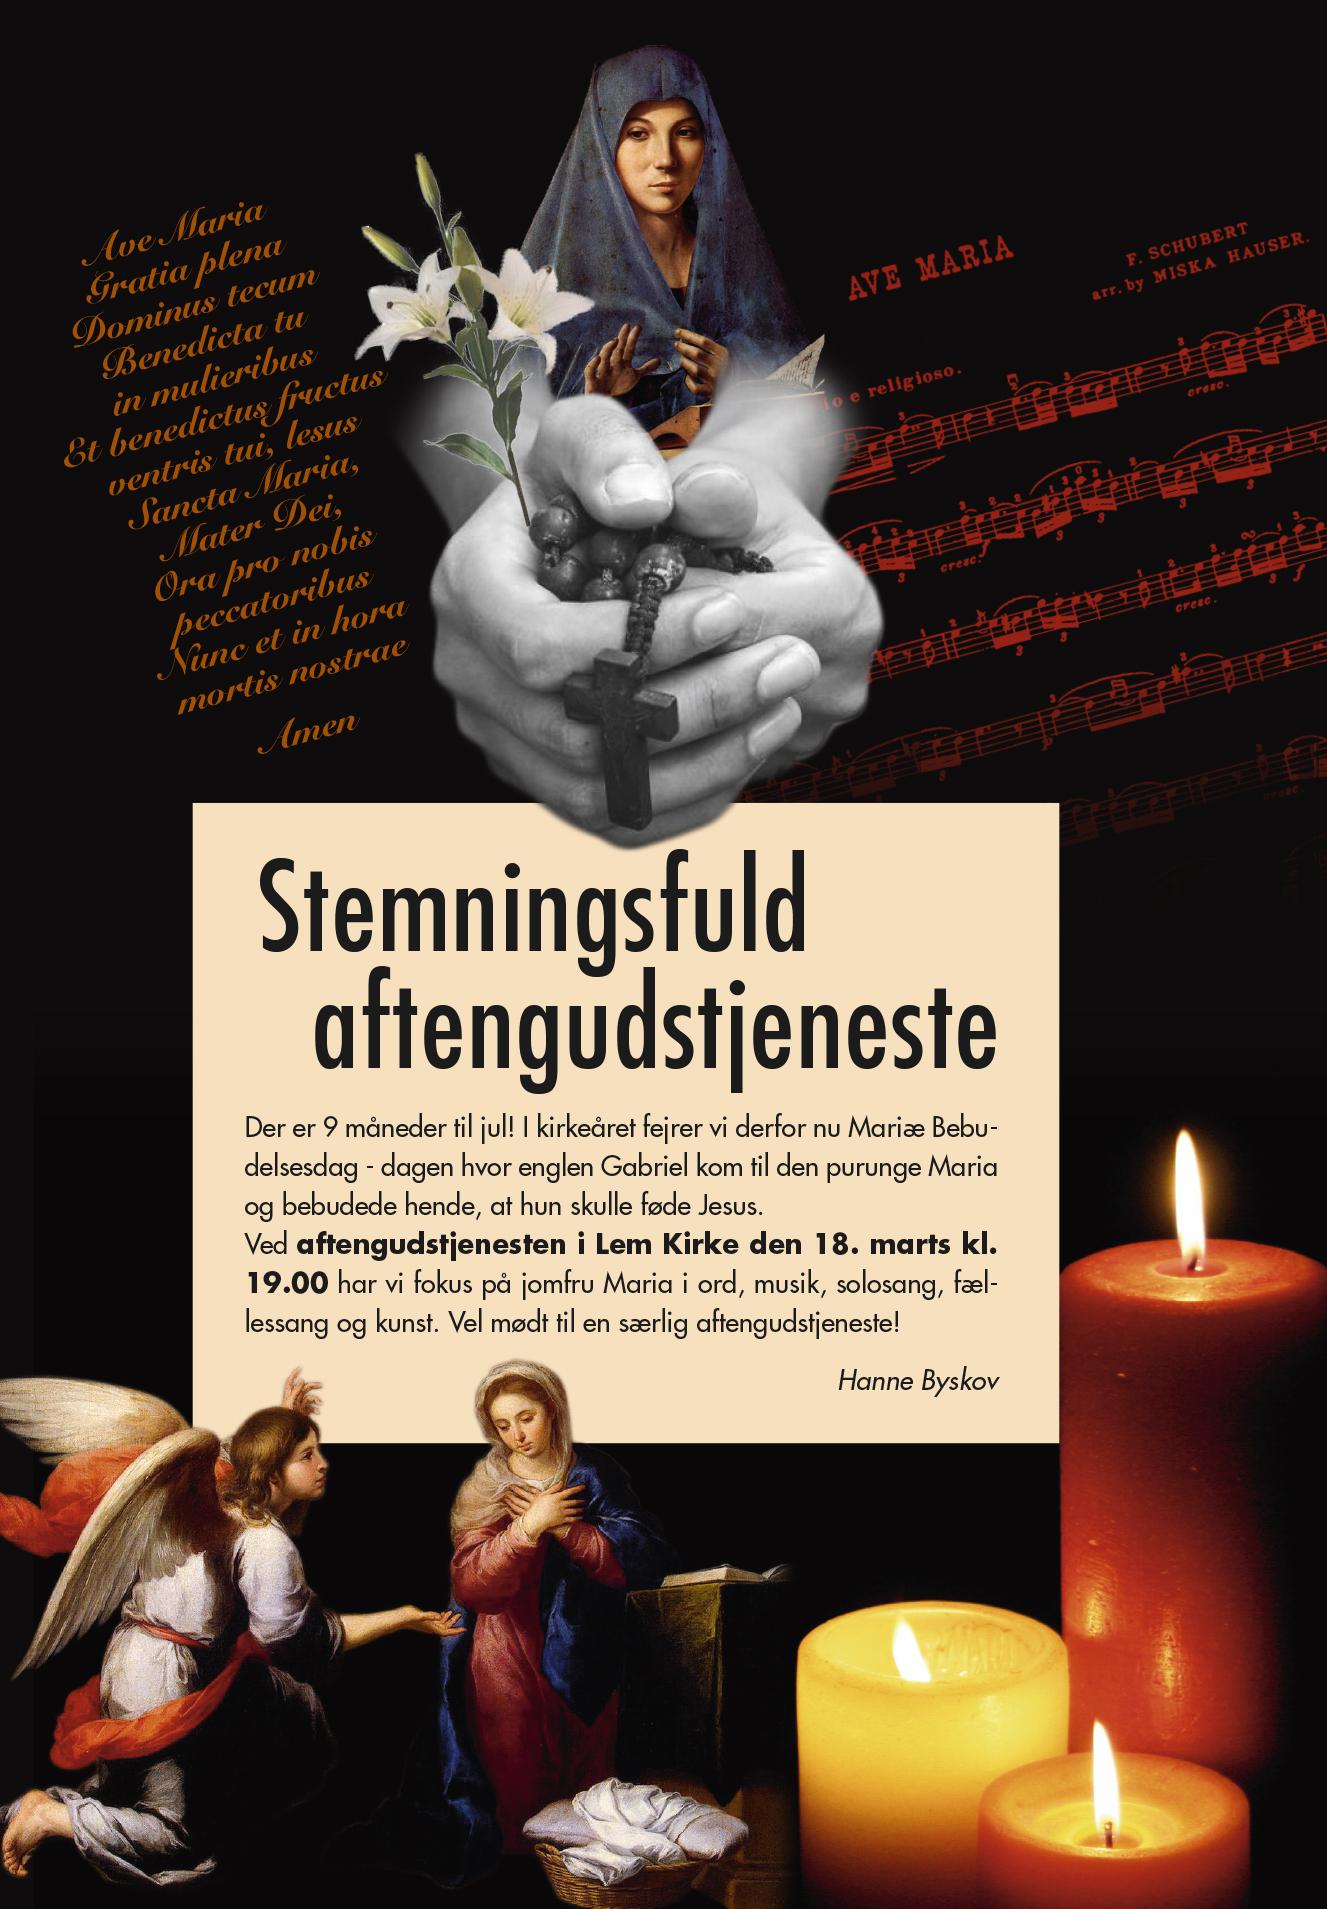 Stemningsfuld aftensgudstjeneste @ Lem Kirke | Lem | Danmark